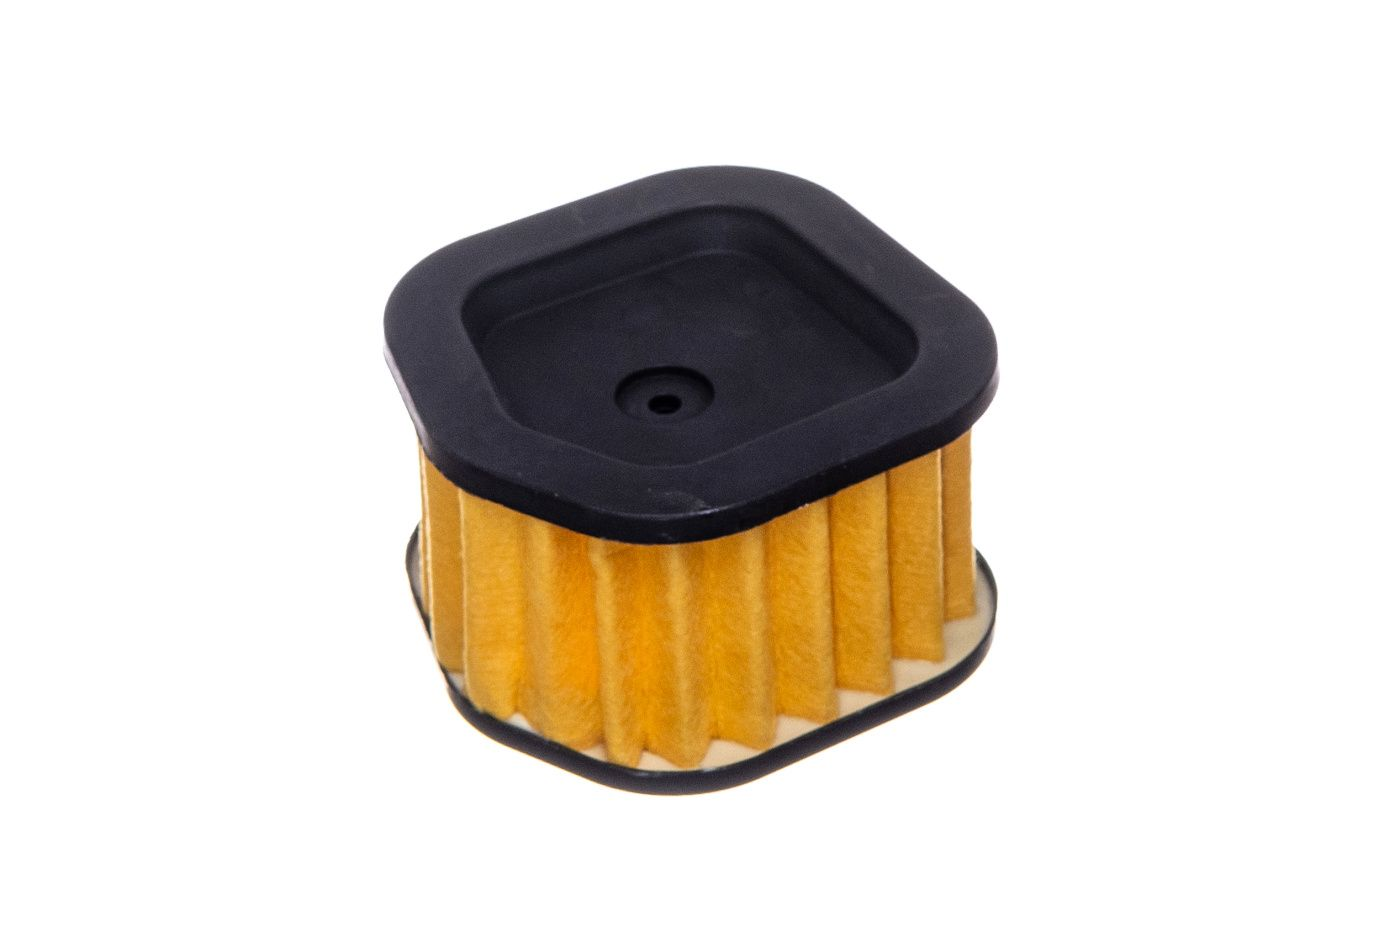 Vzduchový filtr Husqvarna 385 390